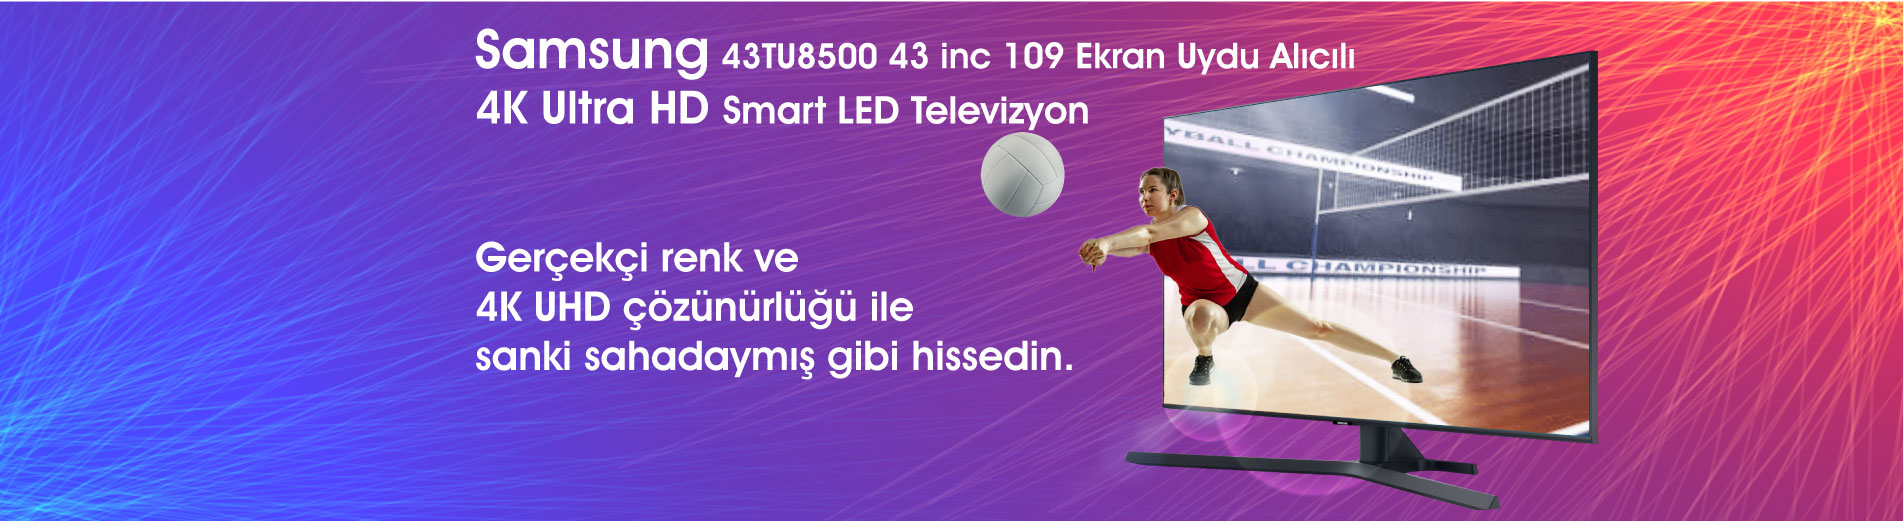 samsung-43tu8500-43-inc-109-ekran-uydu-alicili-4k-ultra-hd-smart-led-televizyon-21622